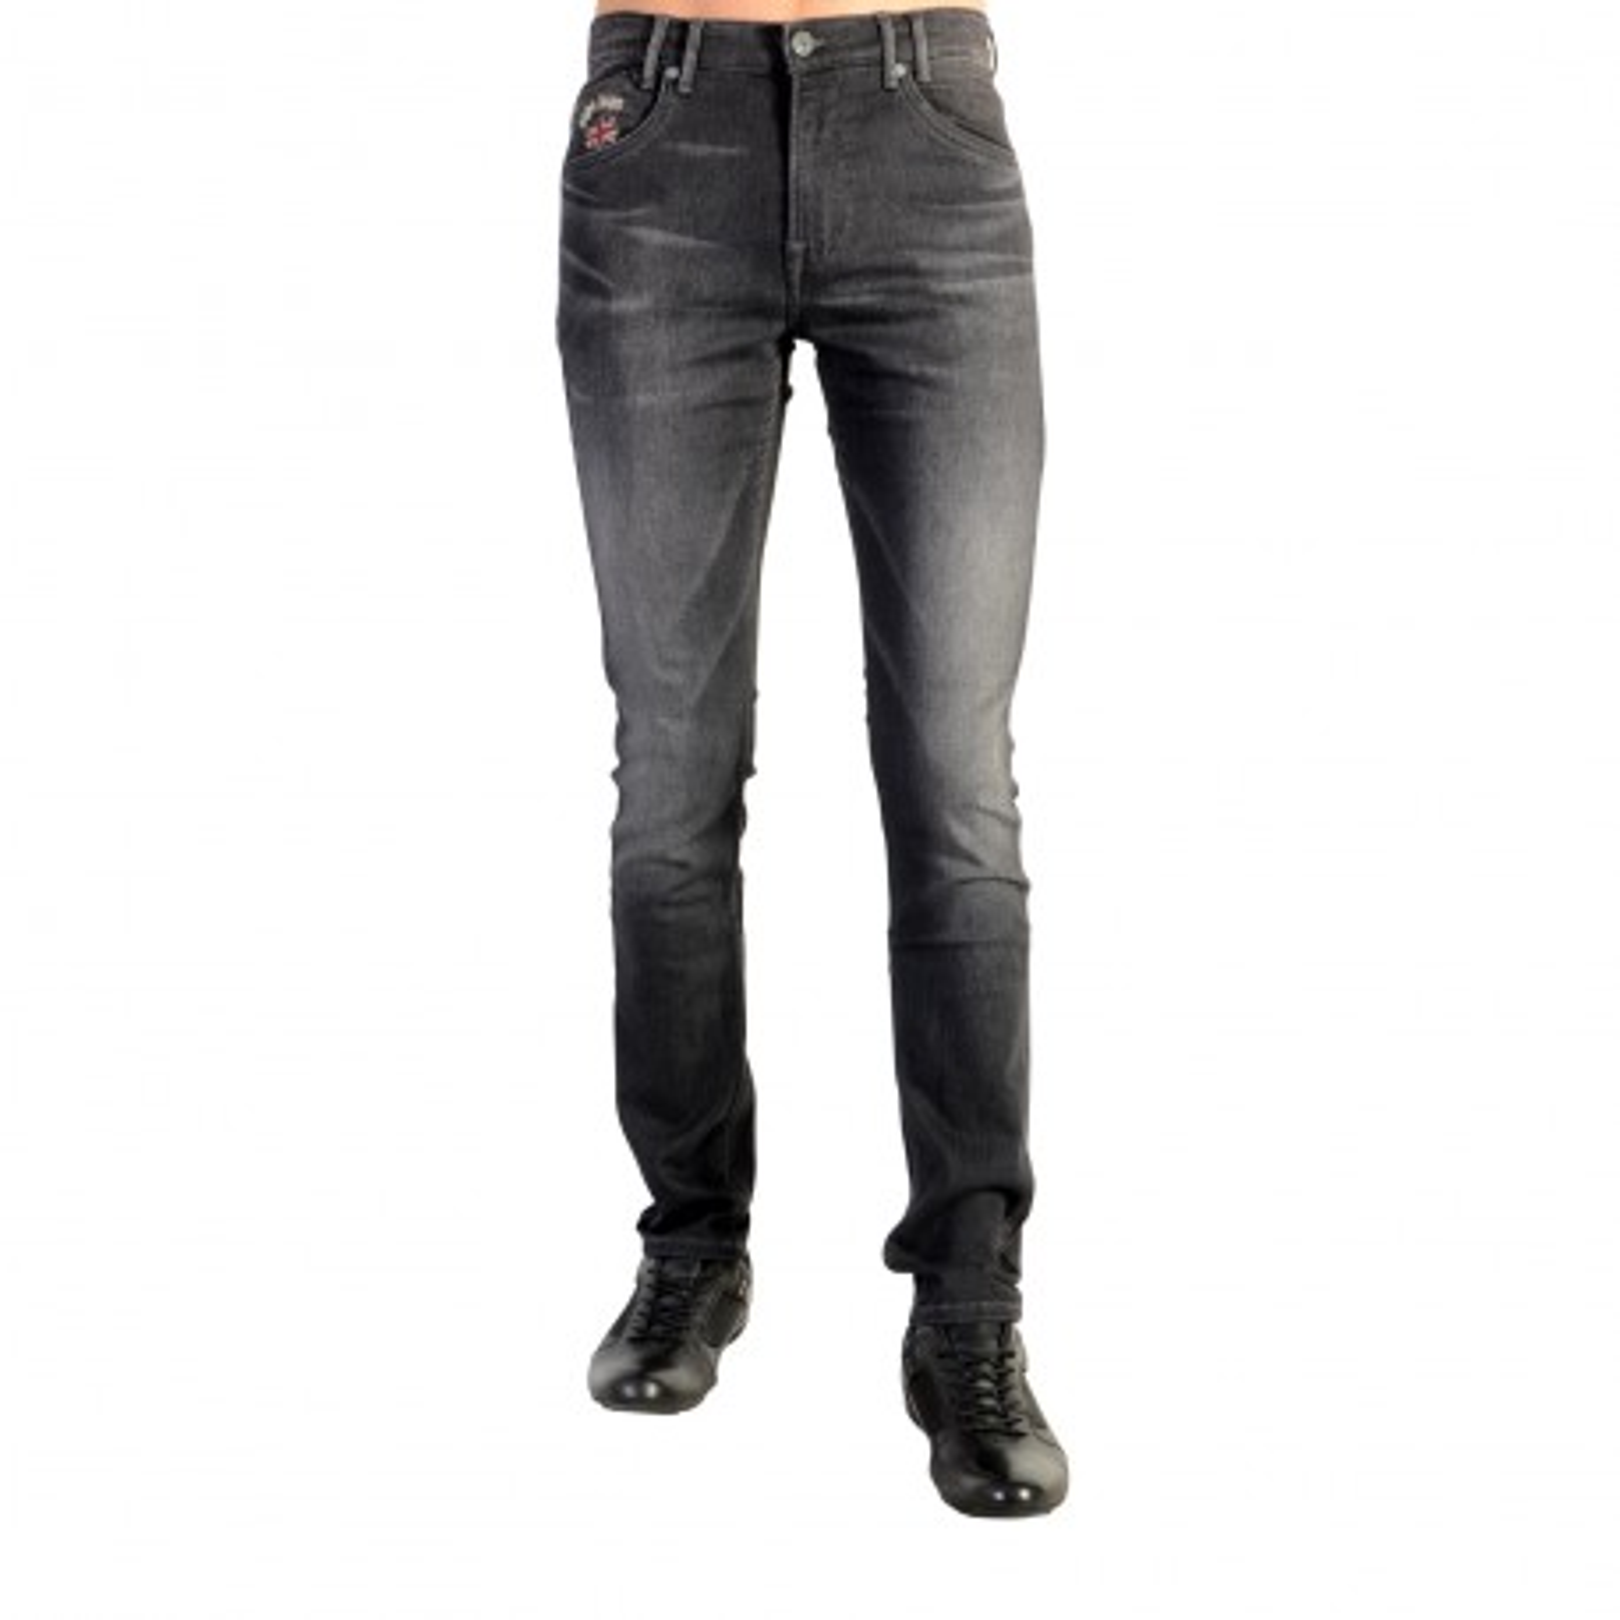 Jeans Pepe Jeans Enfant Sneaker PB200291V96 Denim